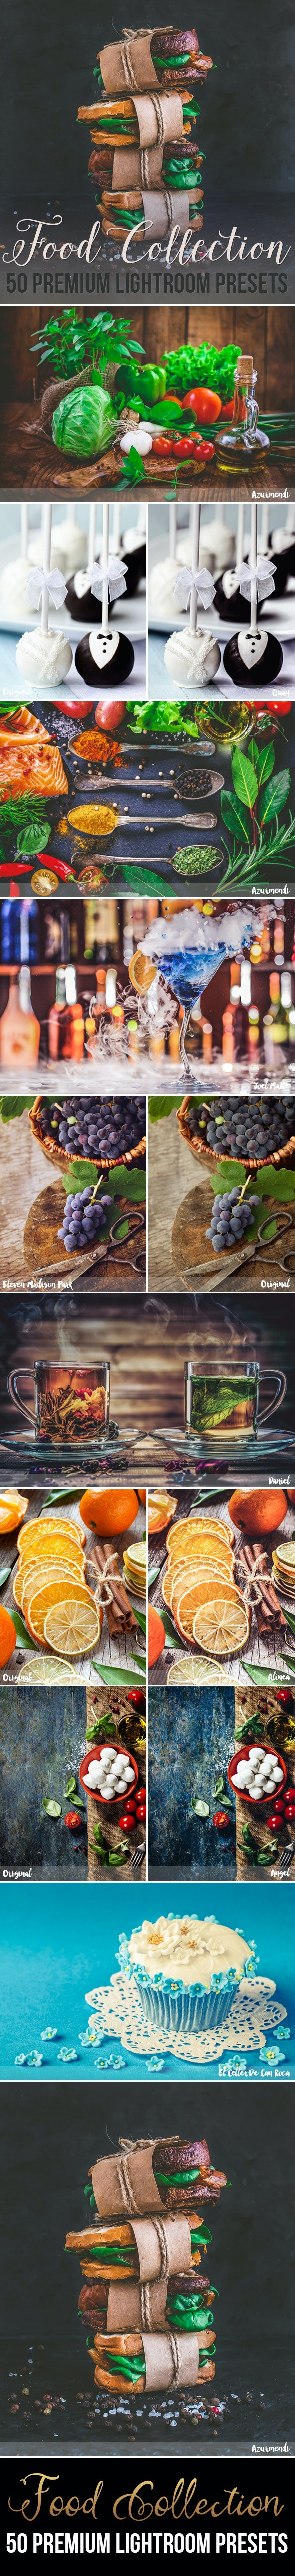 50 Premium Food Photography Lightroom Presets - Lightroom Presets Add-ons